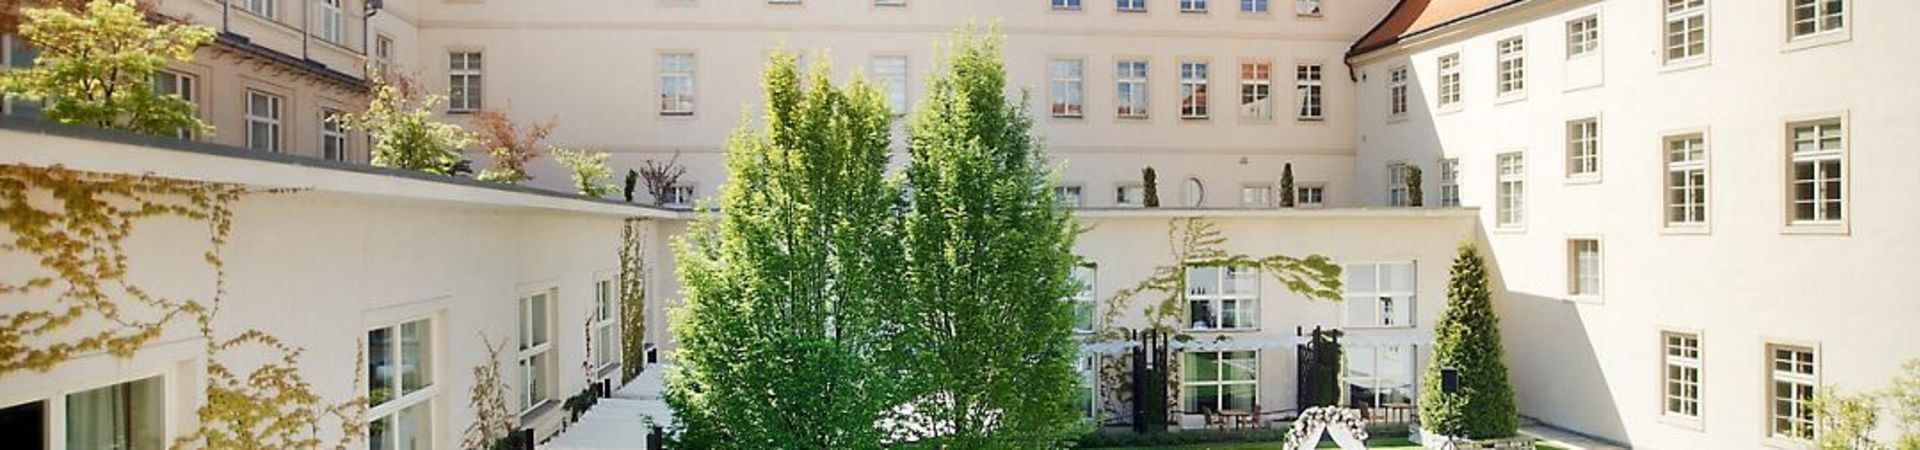 Mandarin Oriental Prague - Monastery Garden